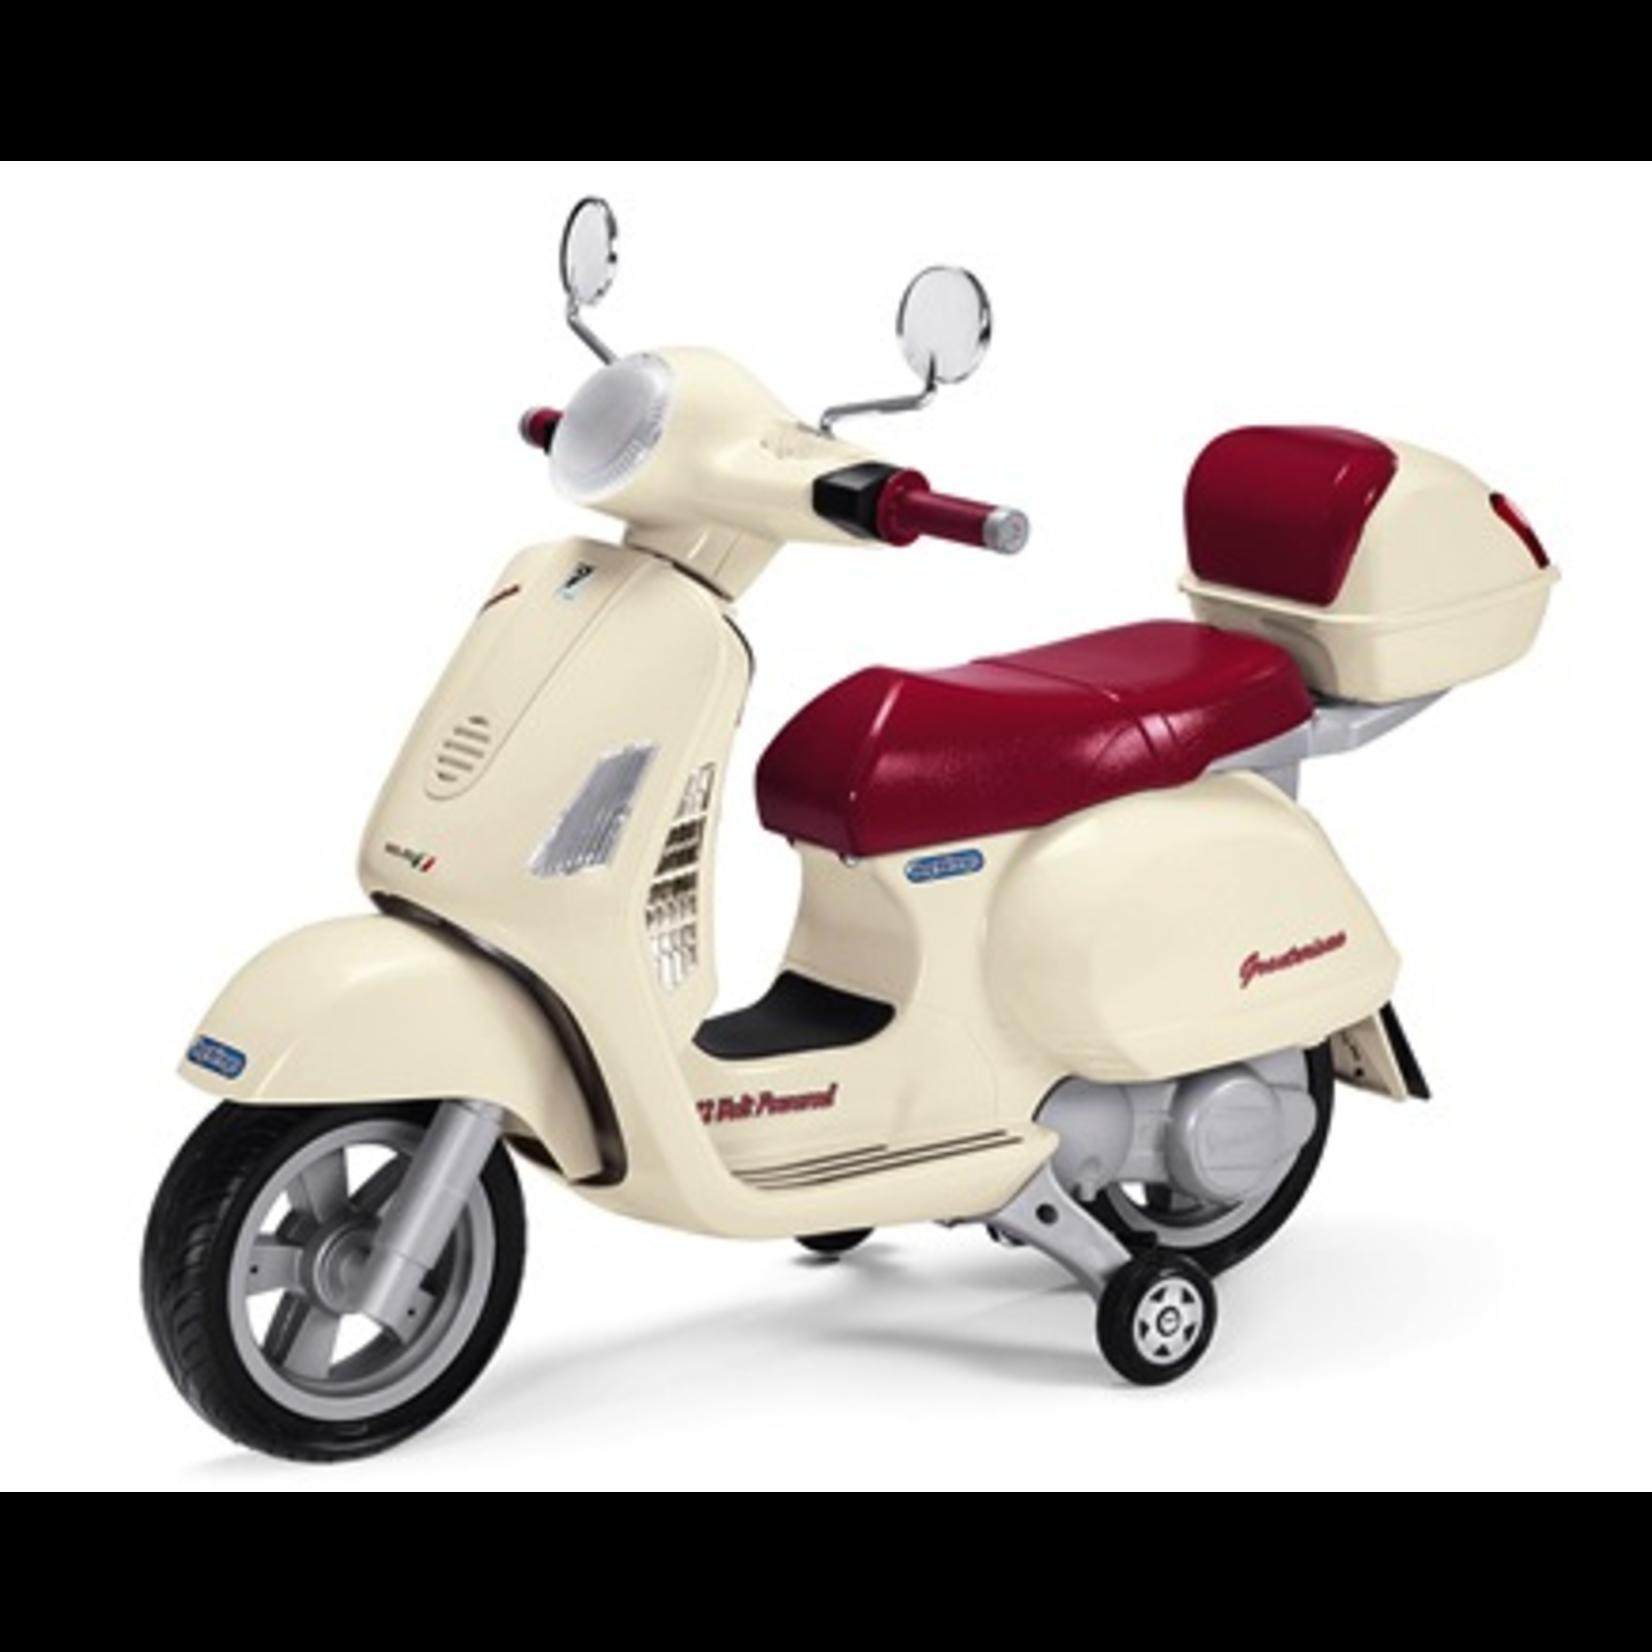 Lifestyle Peg Perego Vespa GT 12 Volt Childrens Scooter White/maroon